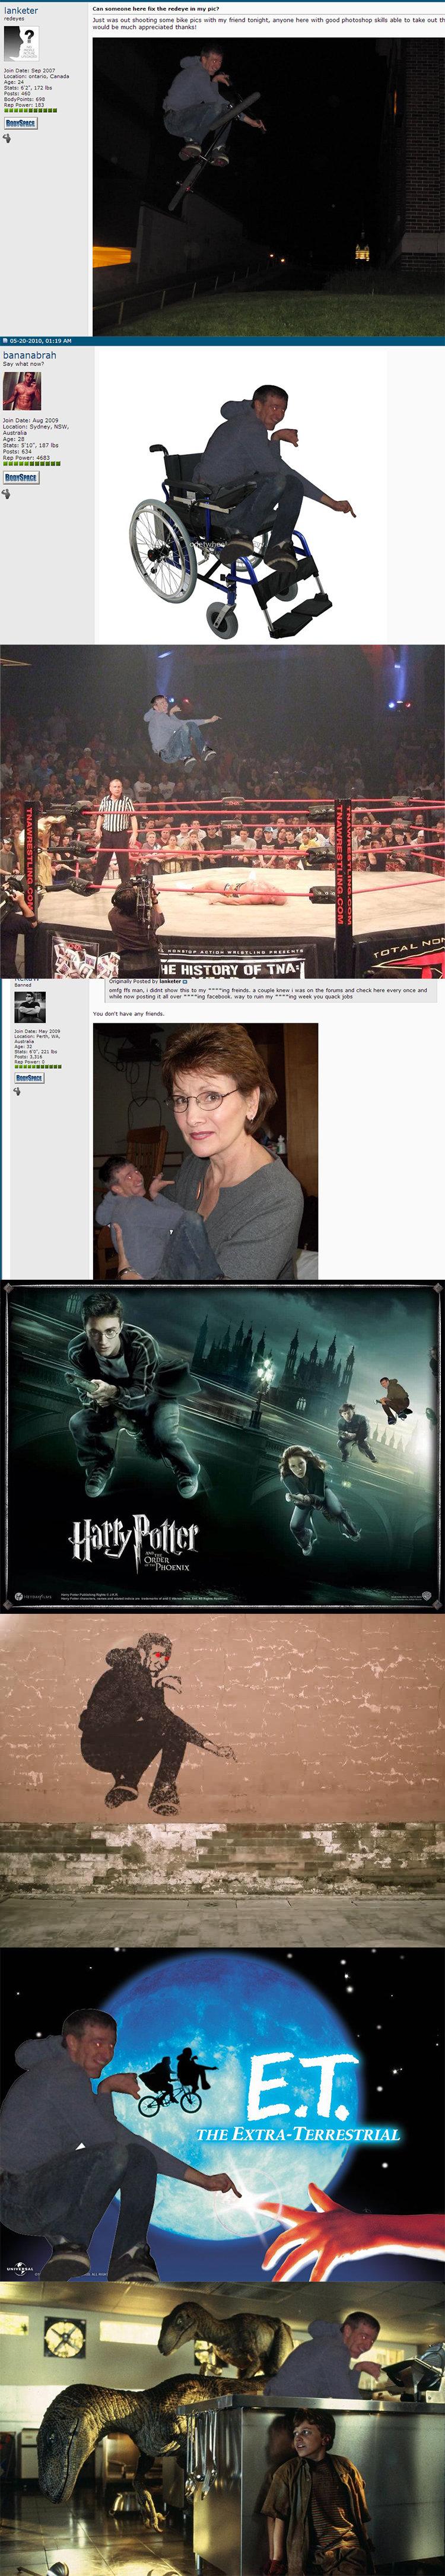 Photoshop Skills. . awn. anione new M!!! mum as an zmo, l 'r talt g